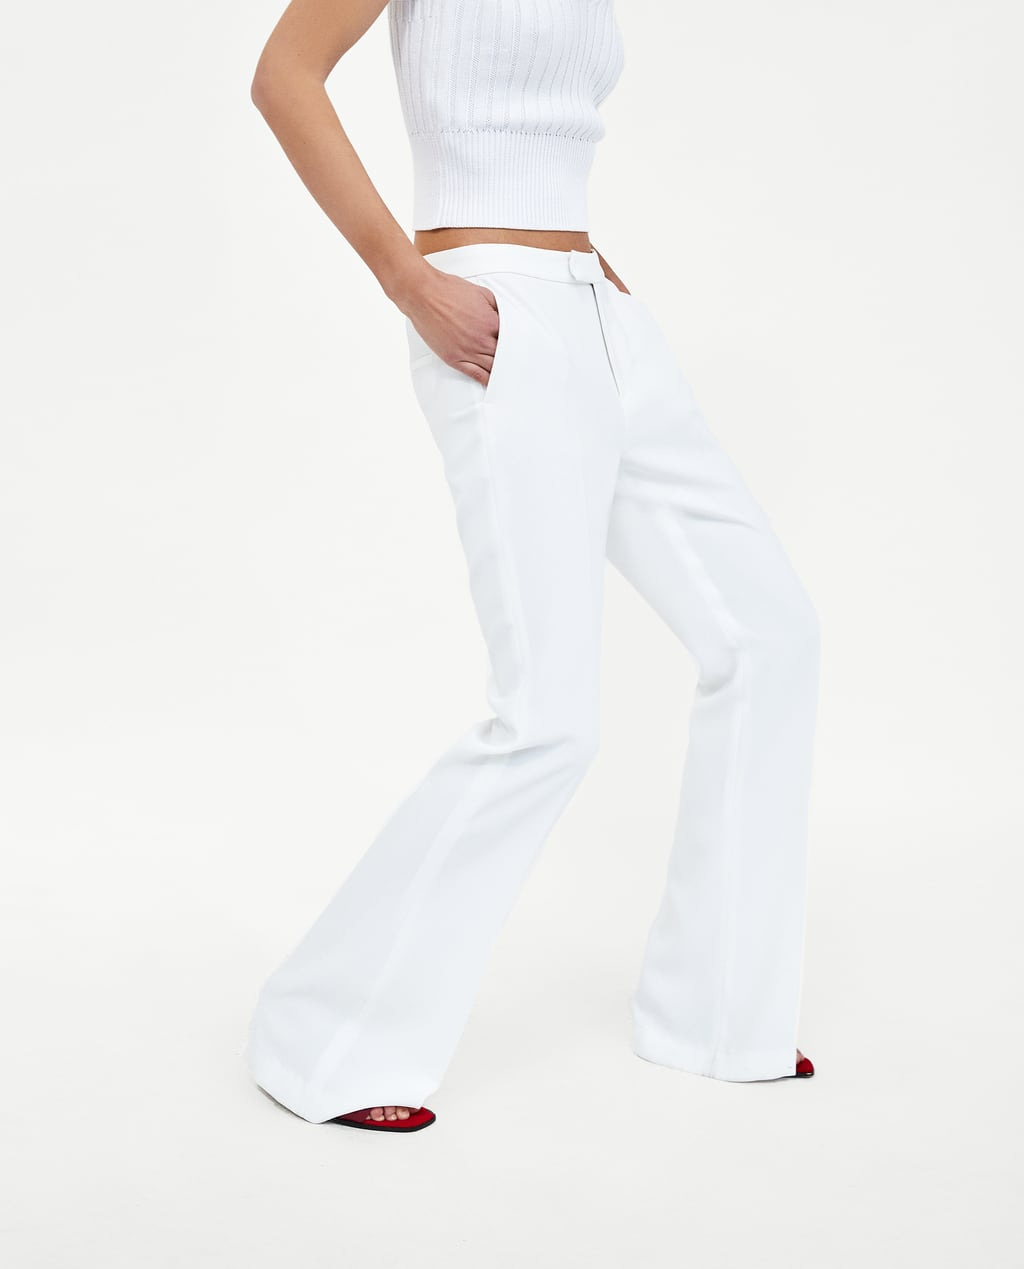 Zara_white tuxedo trousers.jpg